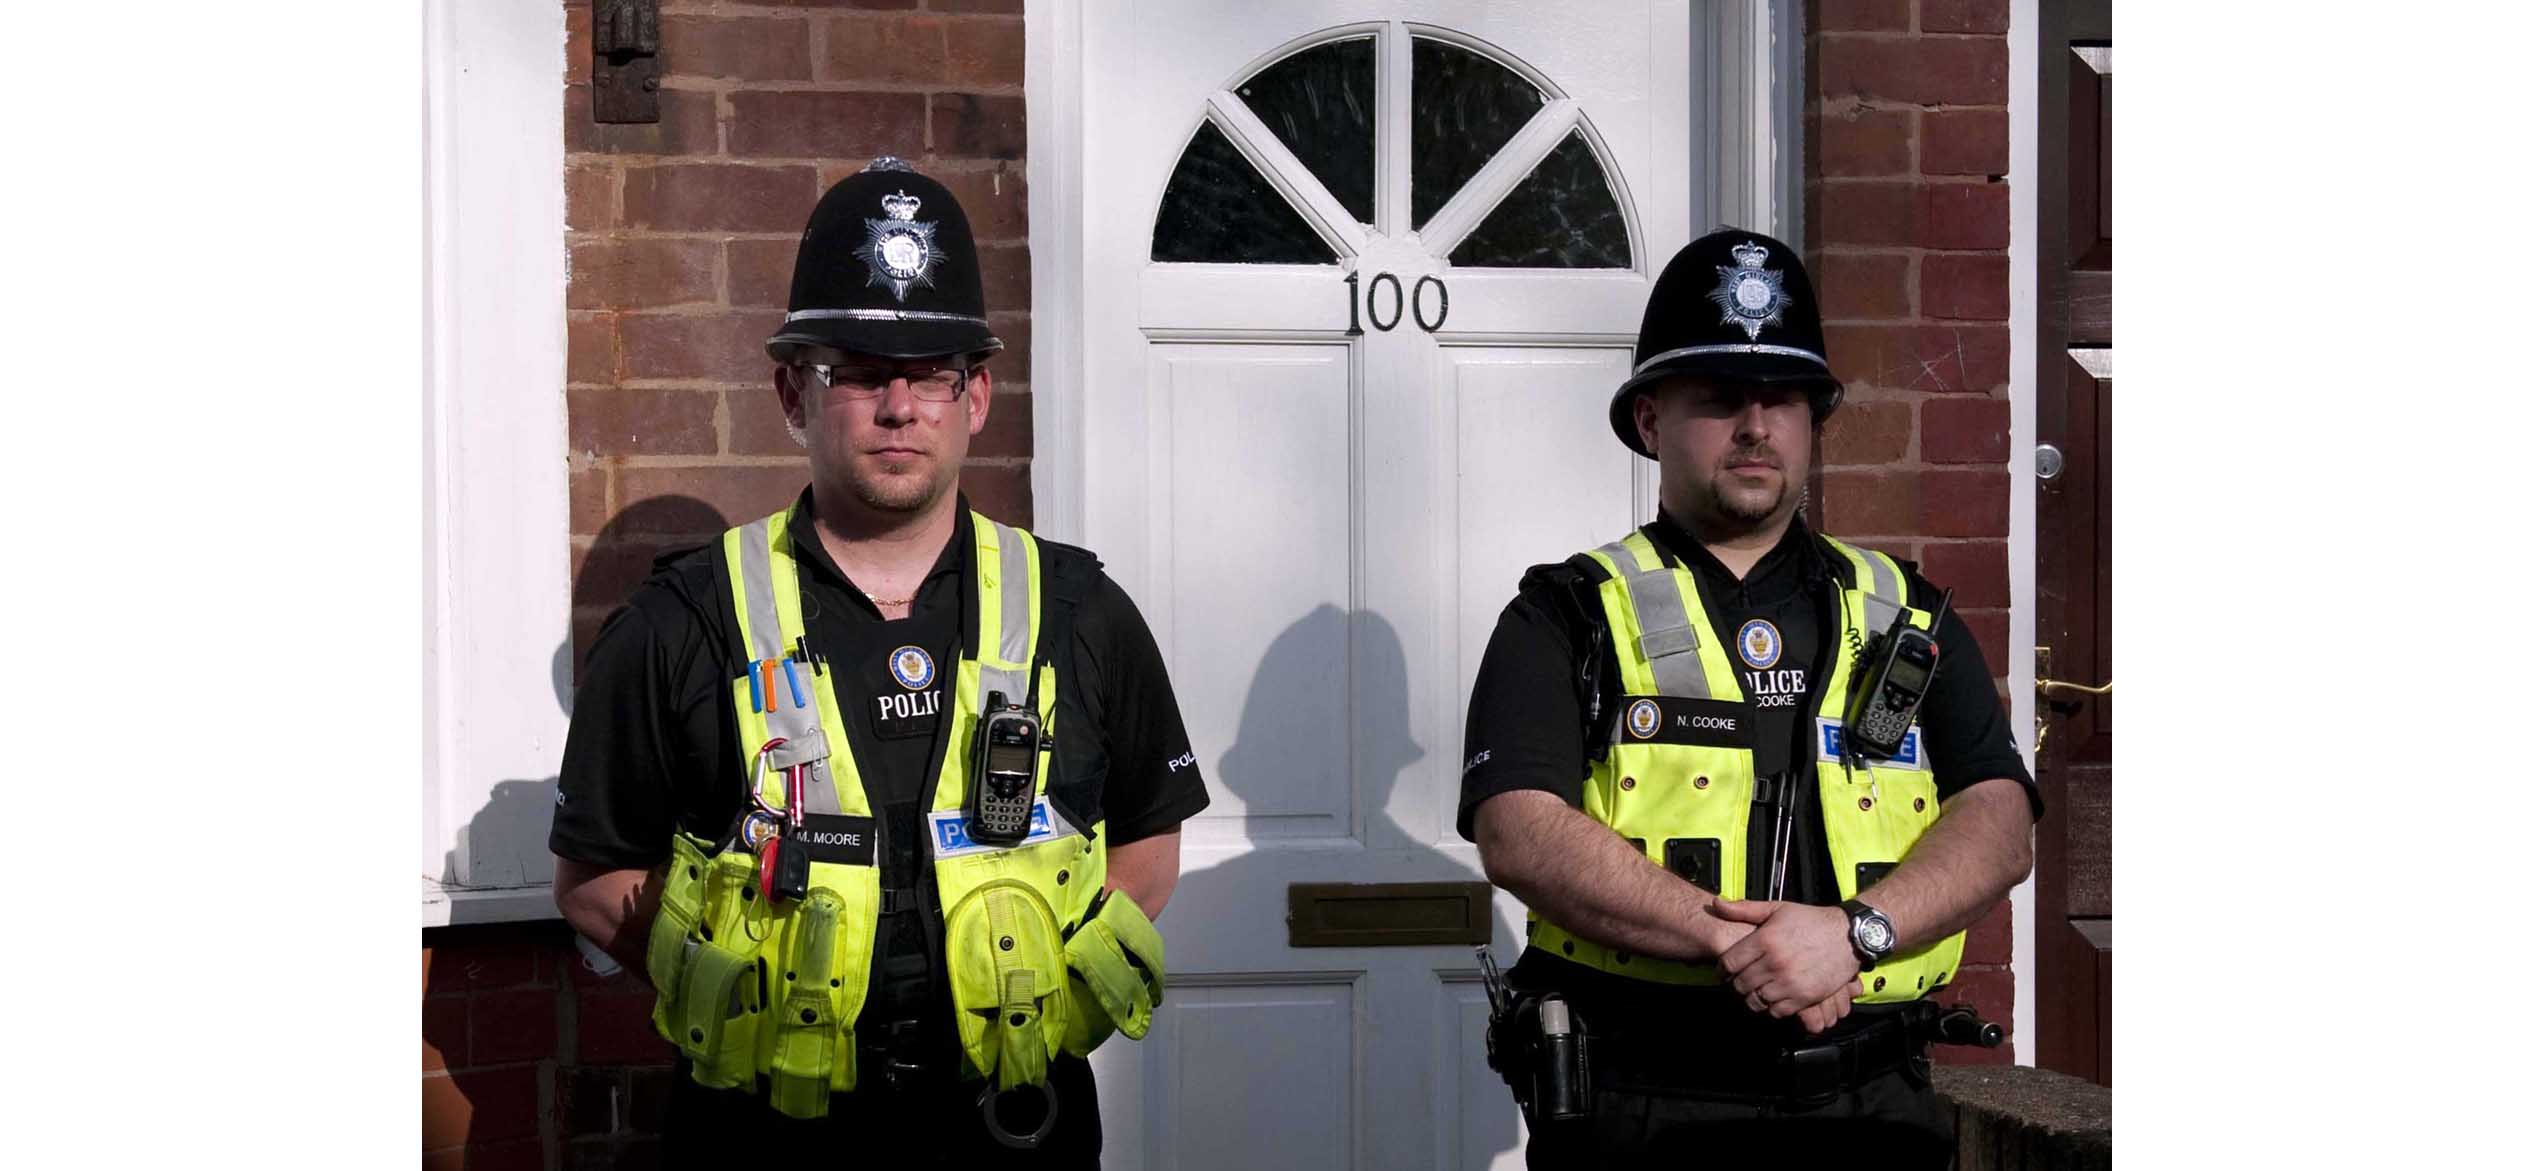 Police outside no 100 at the scene in Albert Road, Birmingham.